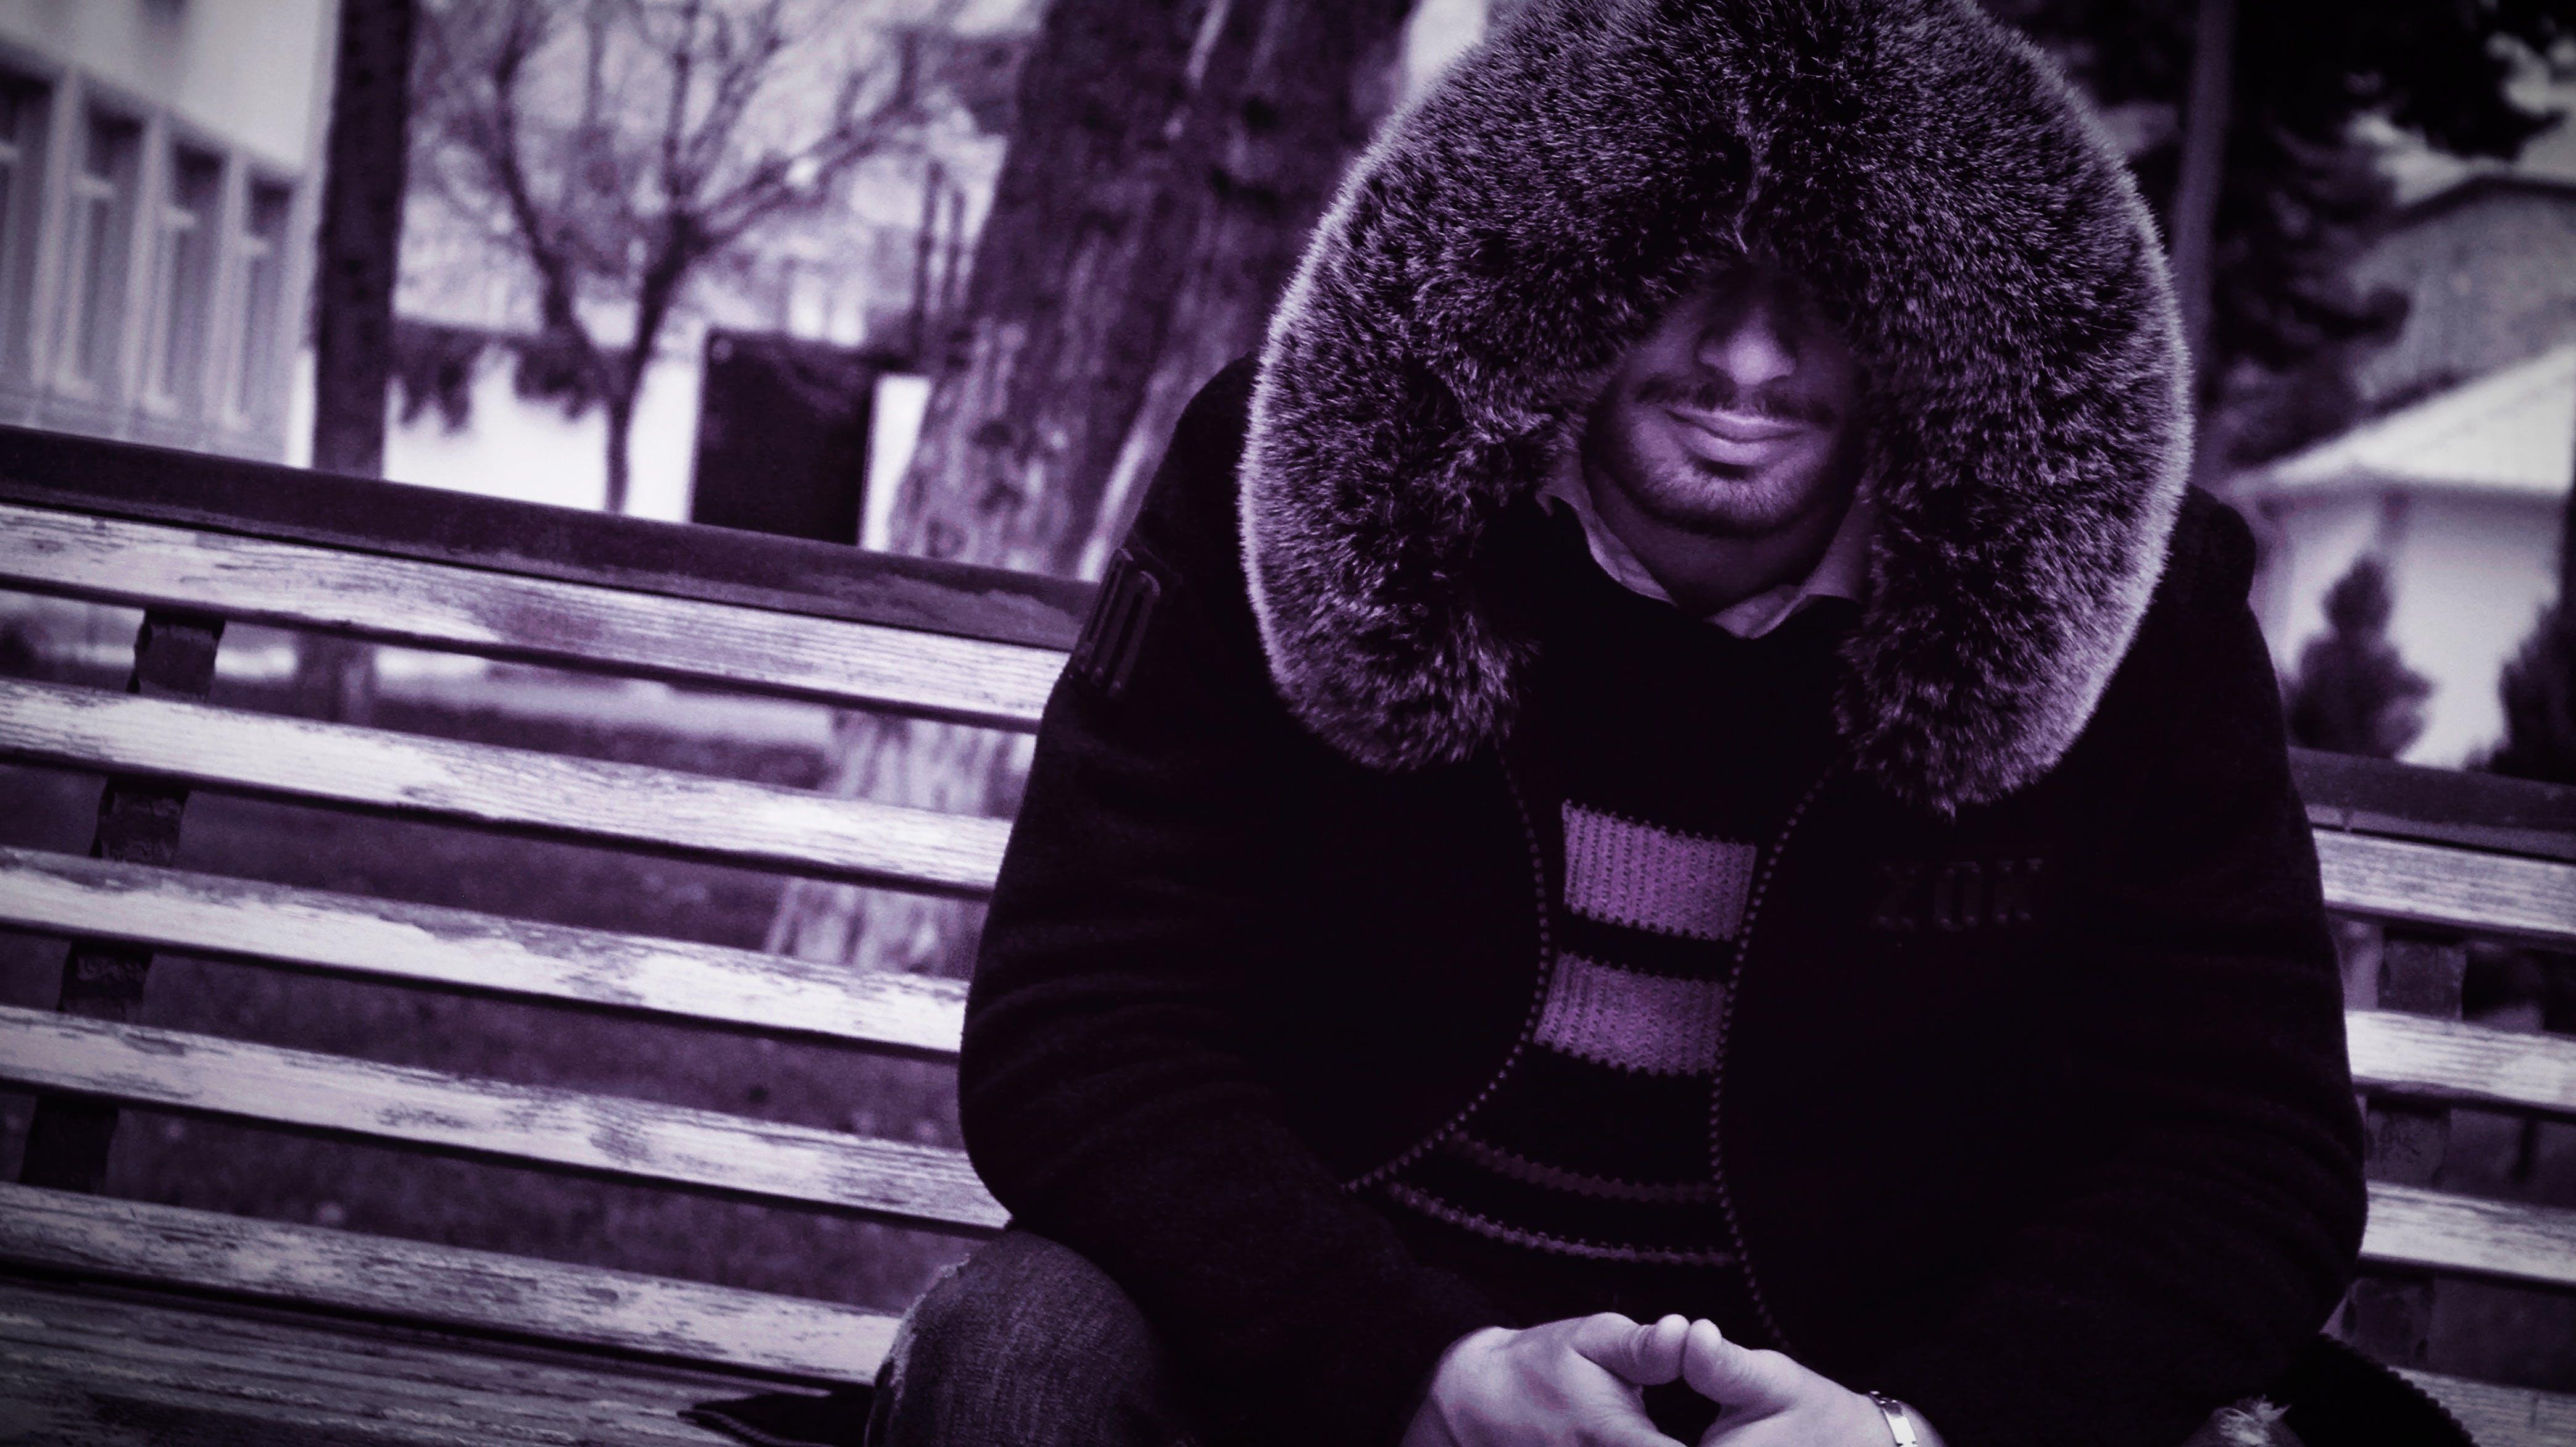 adult, bench, blur